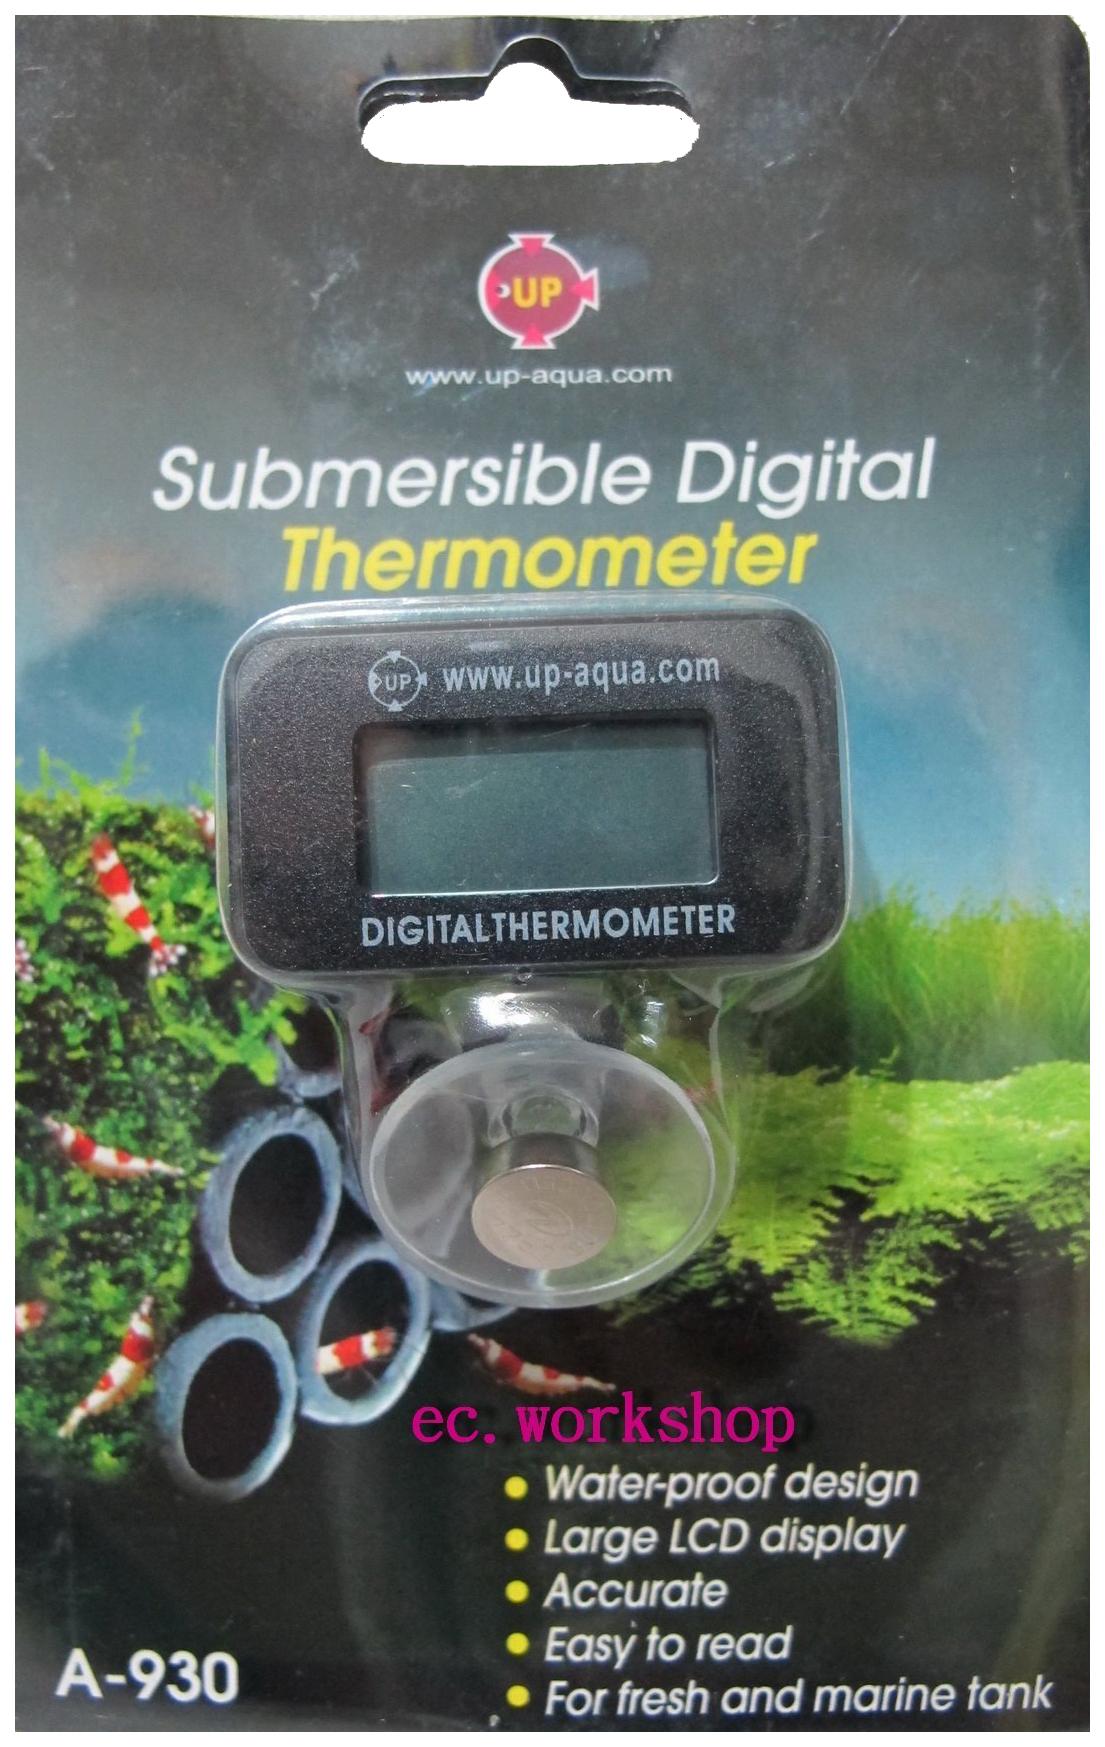 Термометр для аквариума UpAqua Submersible Digital Thermometer,